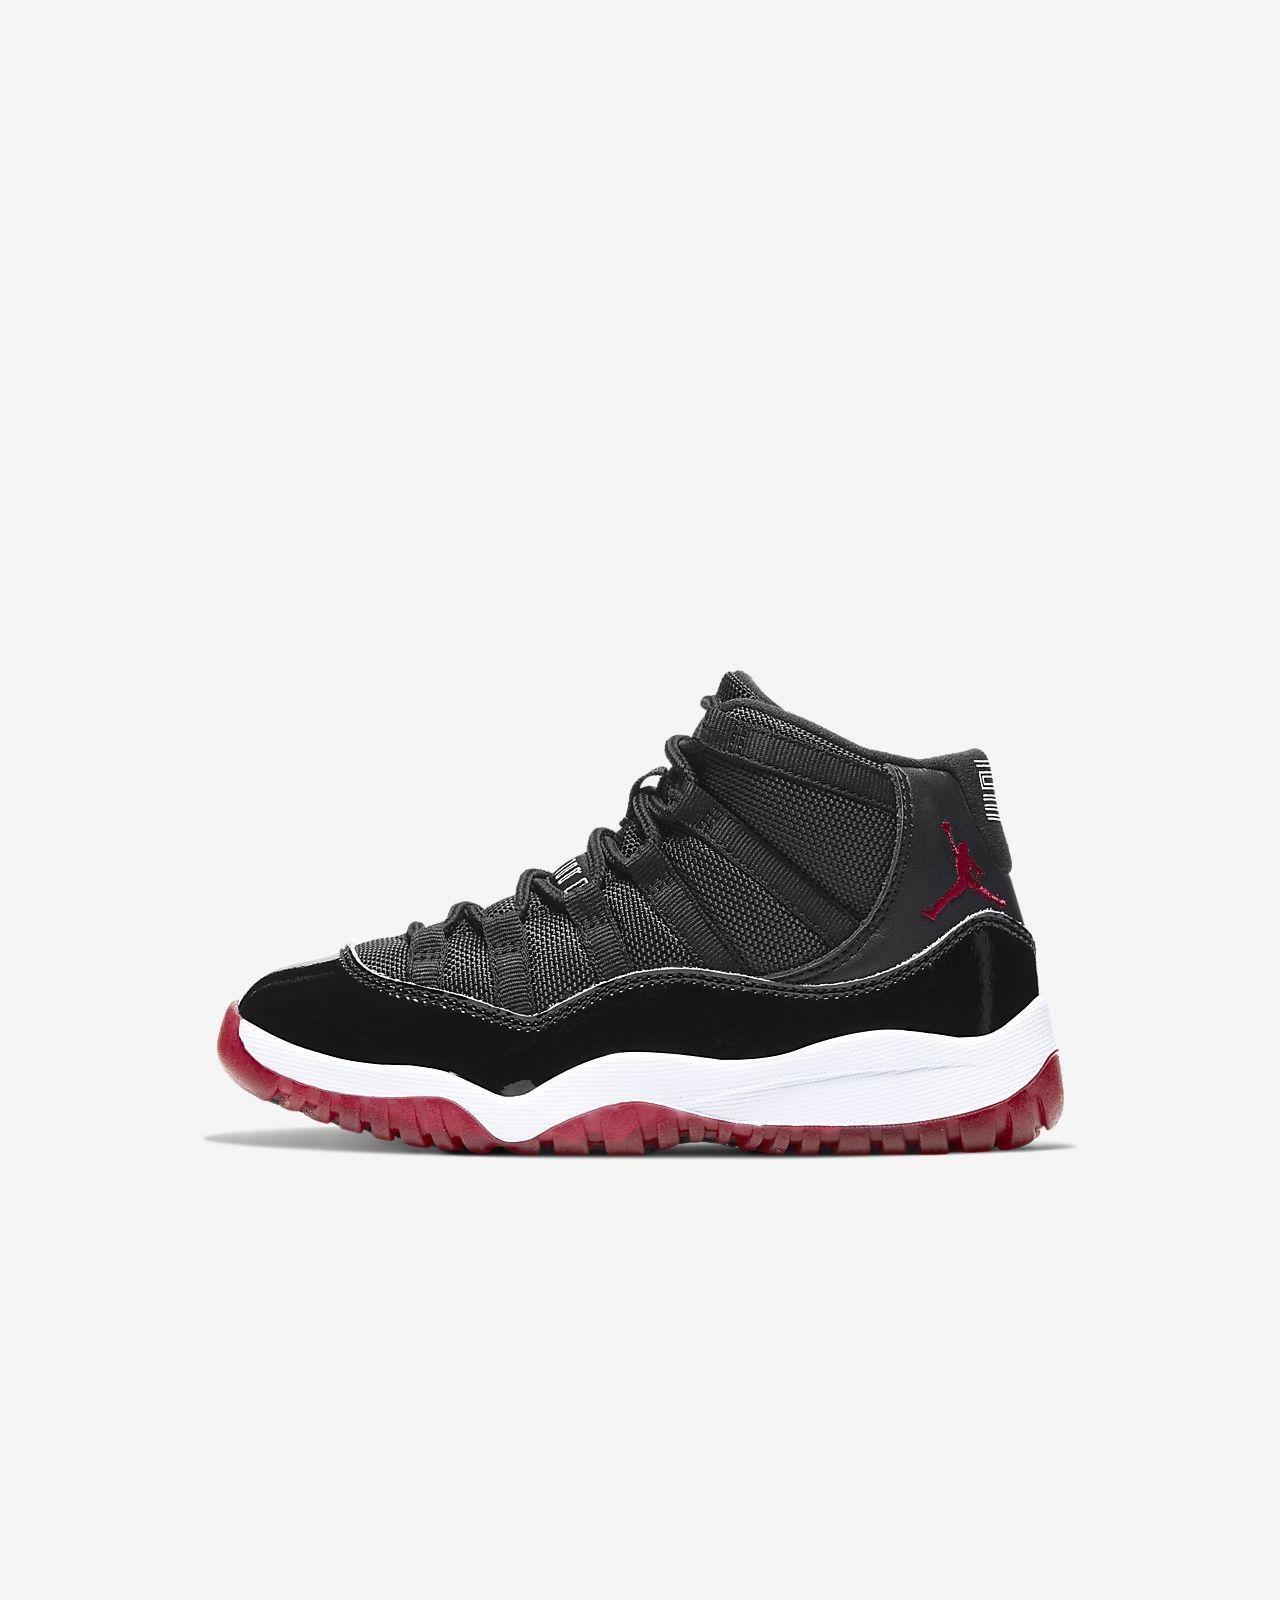 Air Jordan 11 Retro 3/4 Little Kids' Shoe